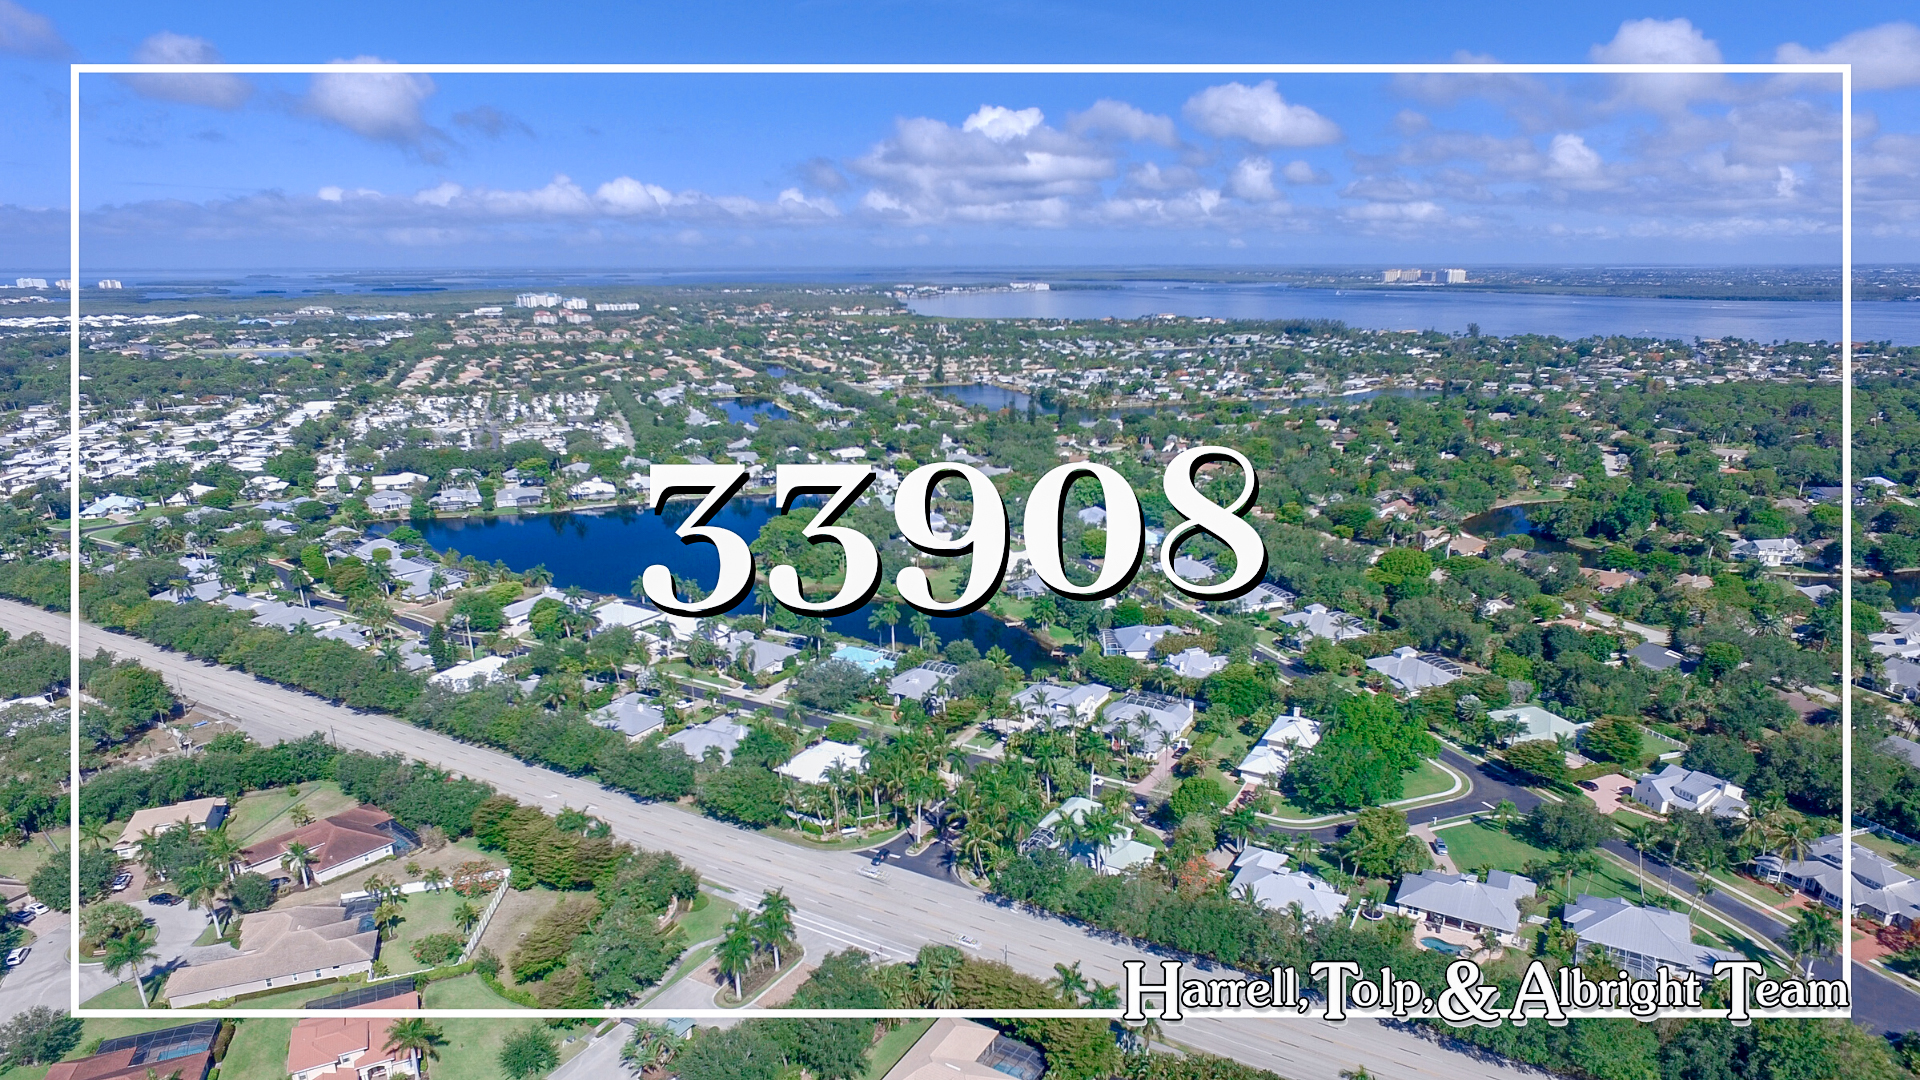 33908 Homes